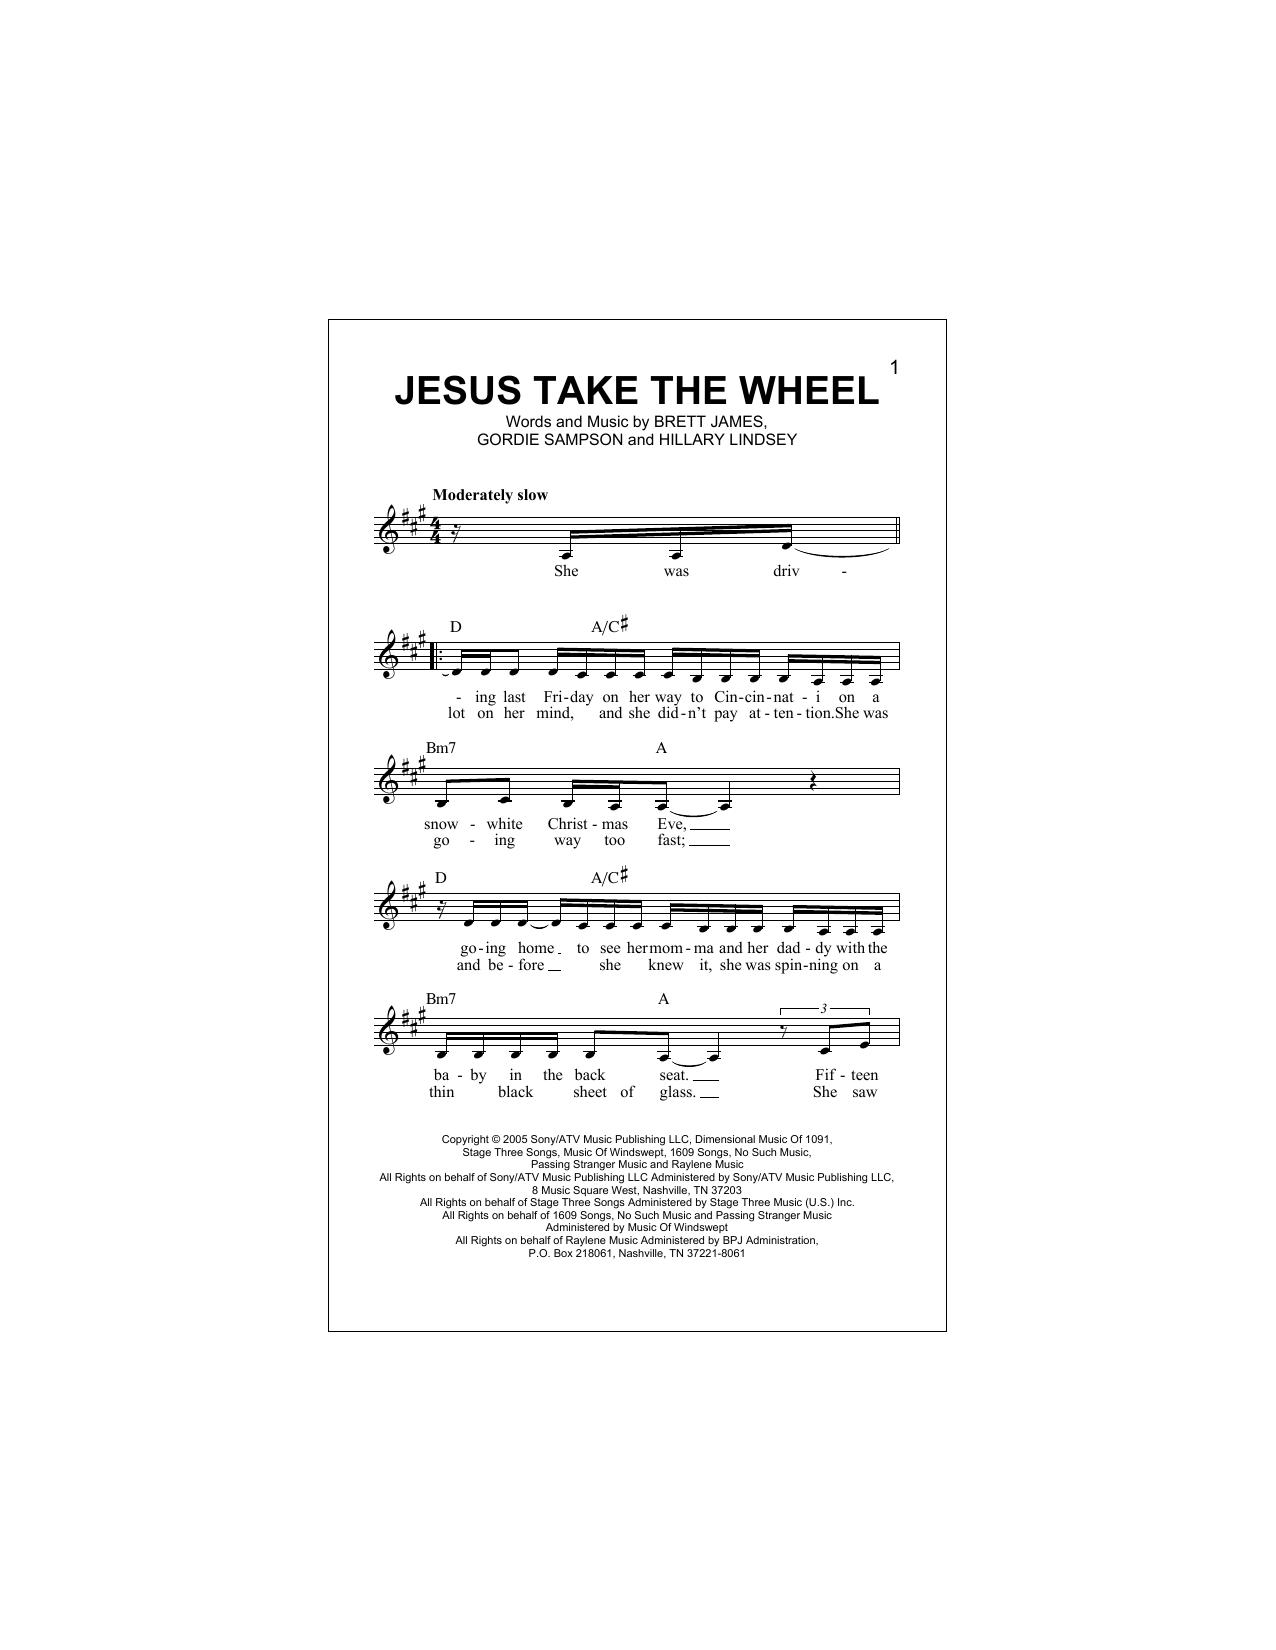 Jesus Take The Wheel Carrie Underwood Melody Line Lyrics Chords